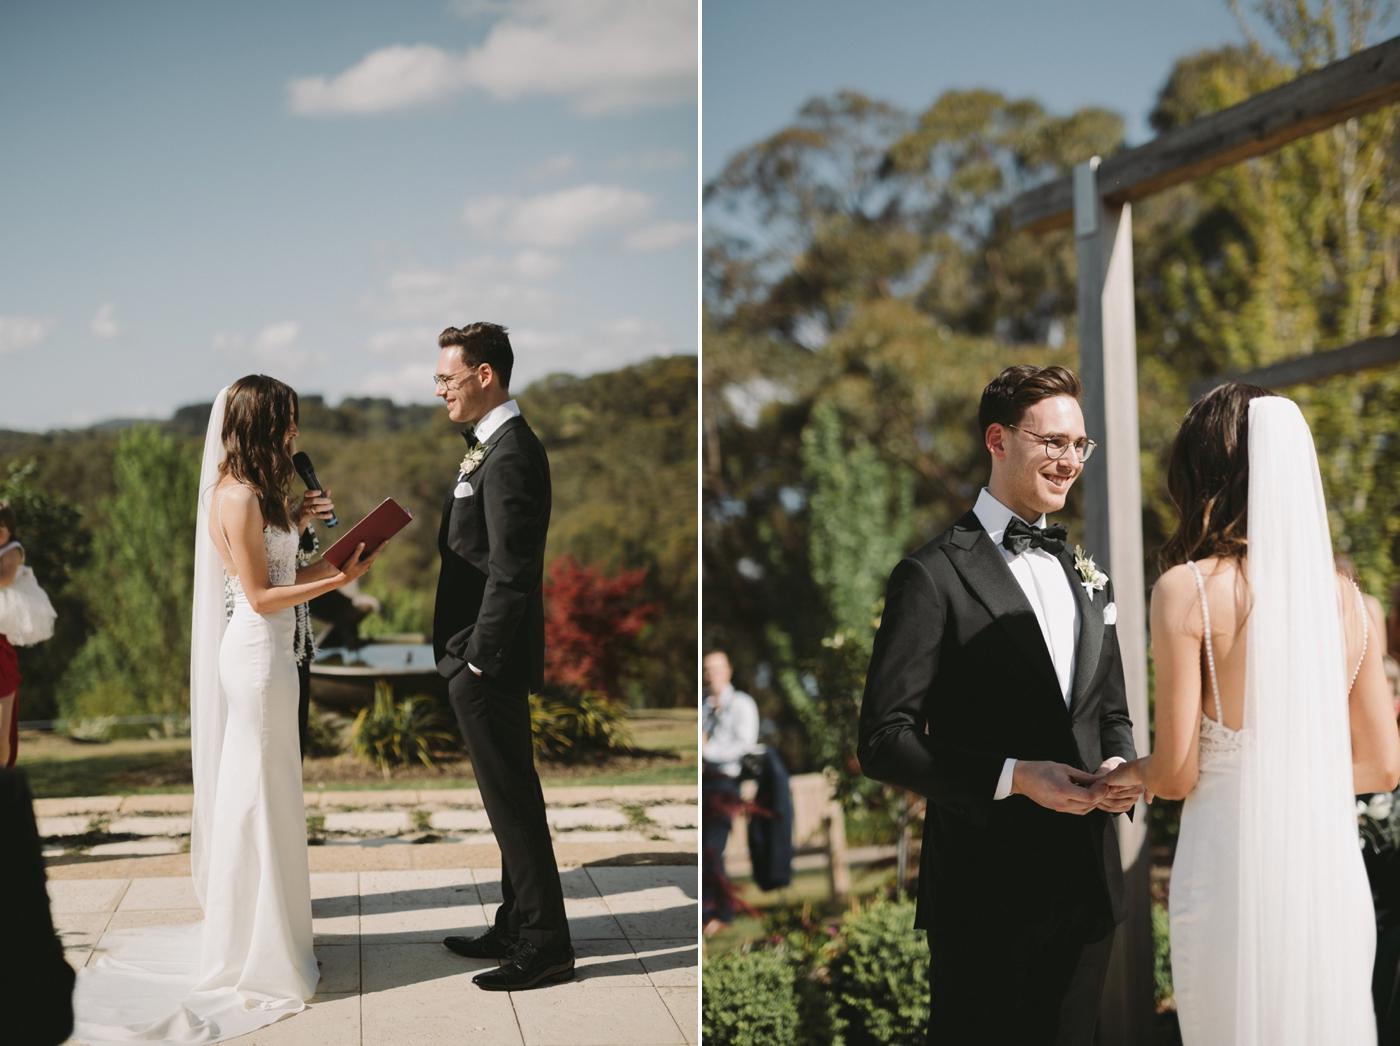 Katie and Ben - Natural Wedding Photography in Adelaide - Beautiful, Candid Wedding Photographer - Adelaide Hills Wedding - Katherine Schultz - www.katherineschultzphotography.com_0036.jpg